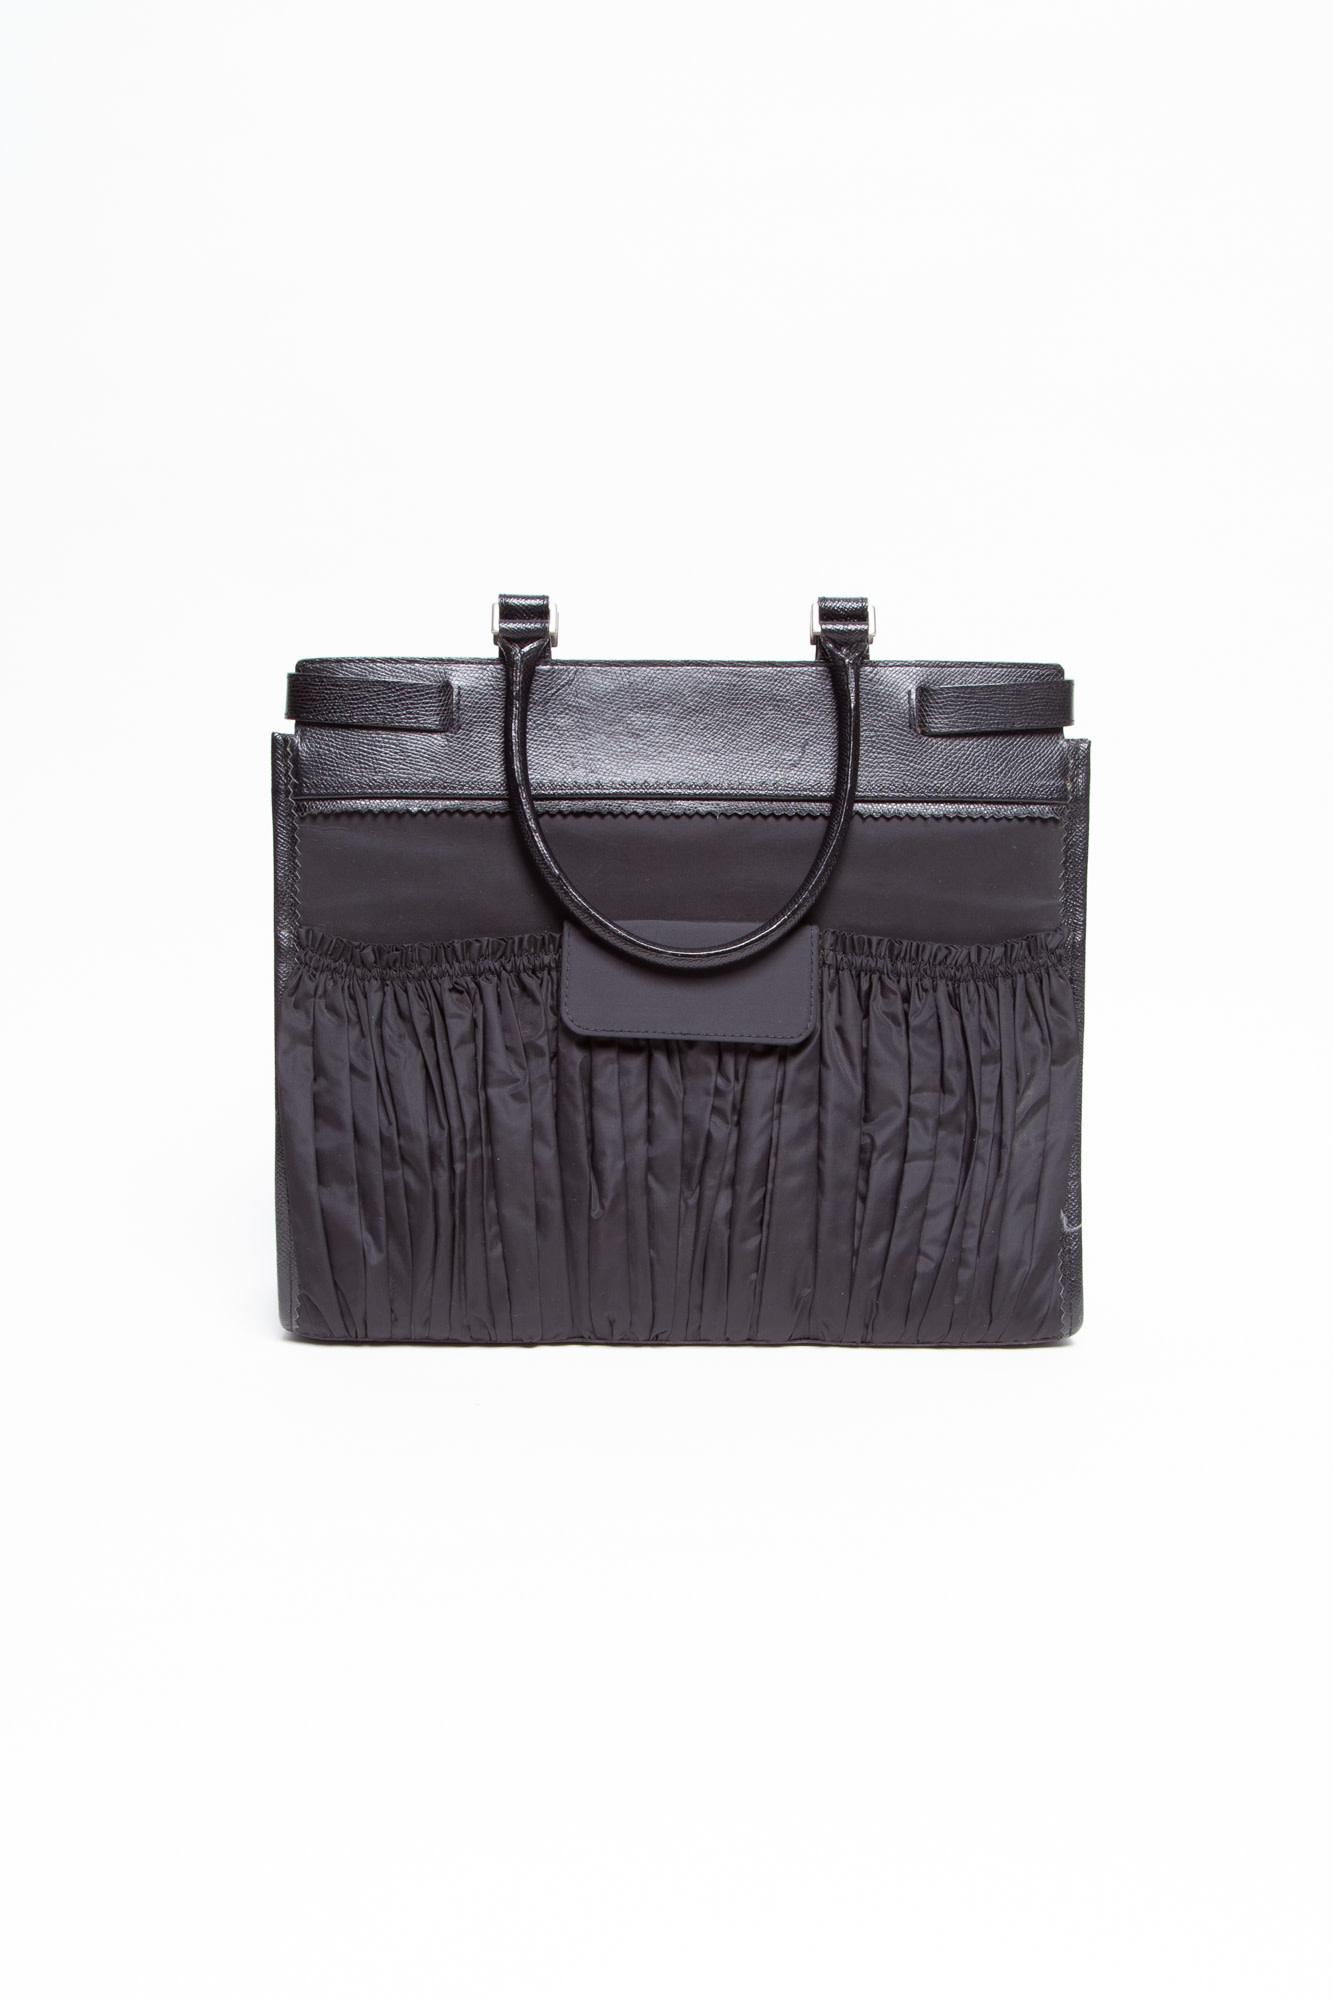 Jean Paul Gaultier BLACK BAG